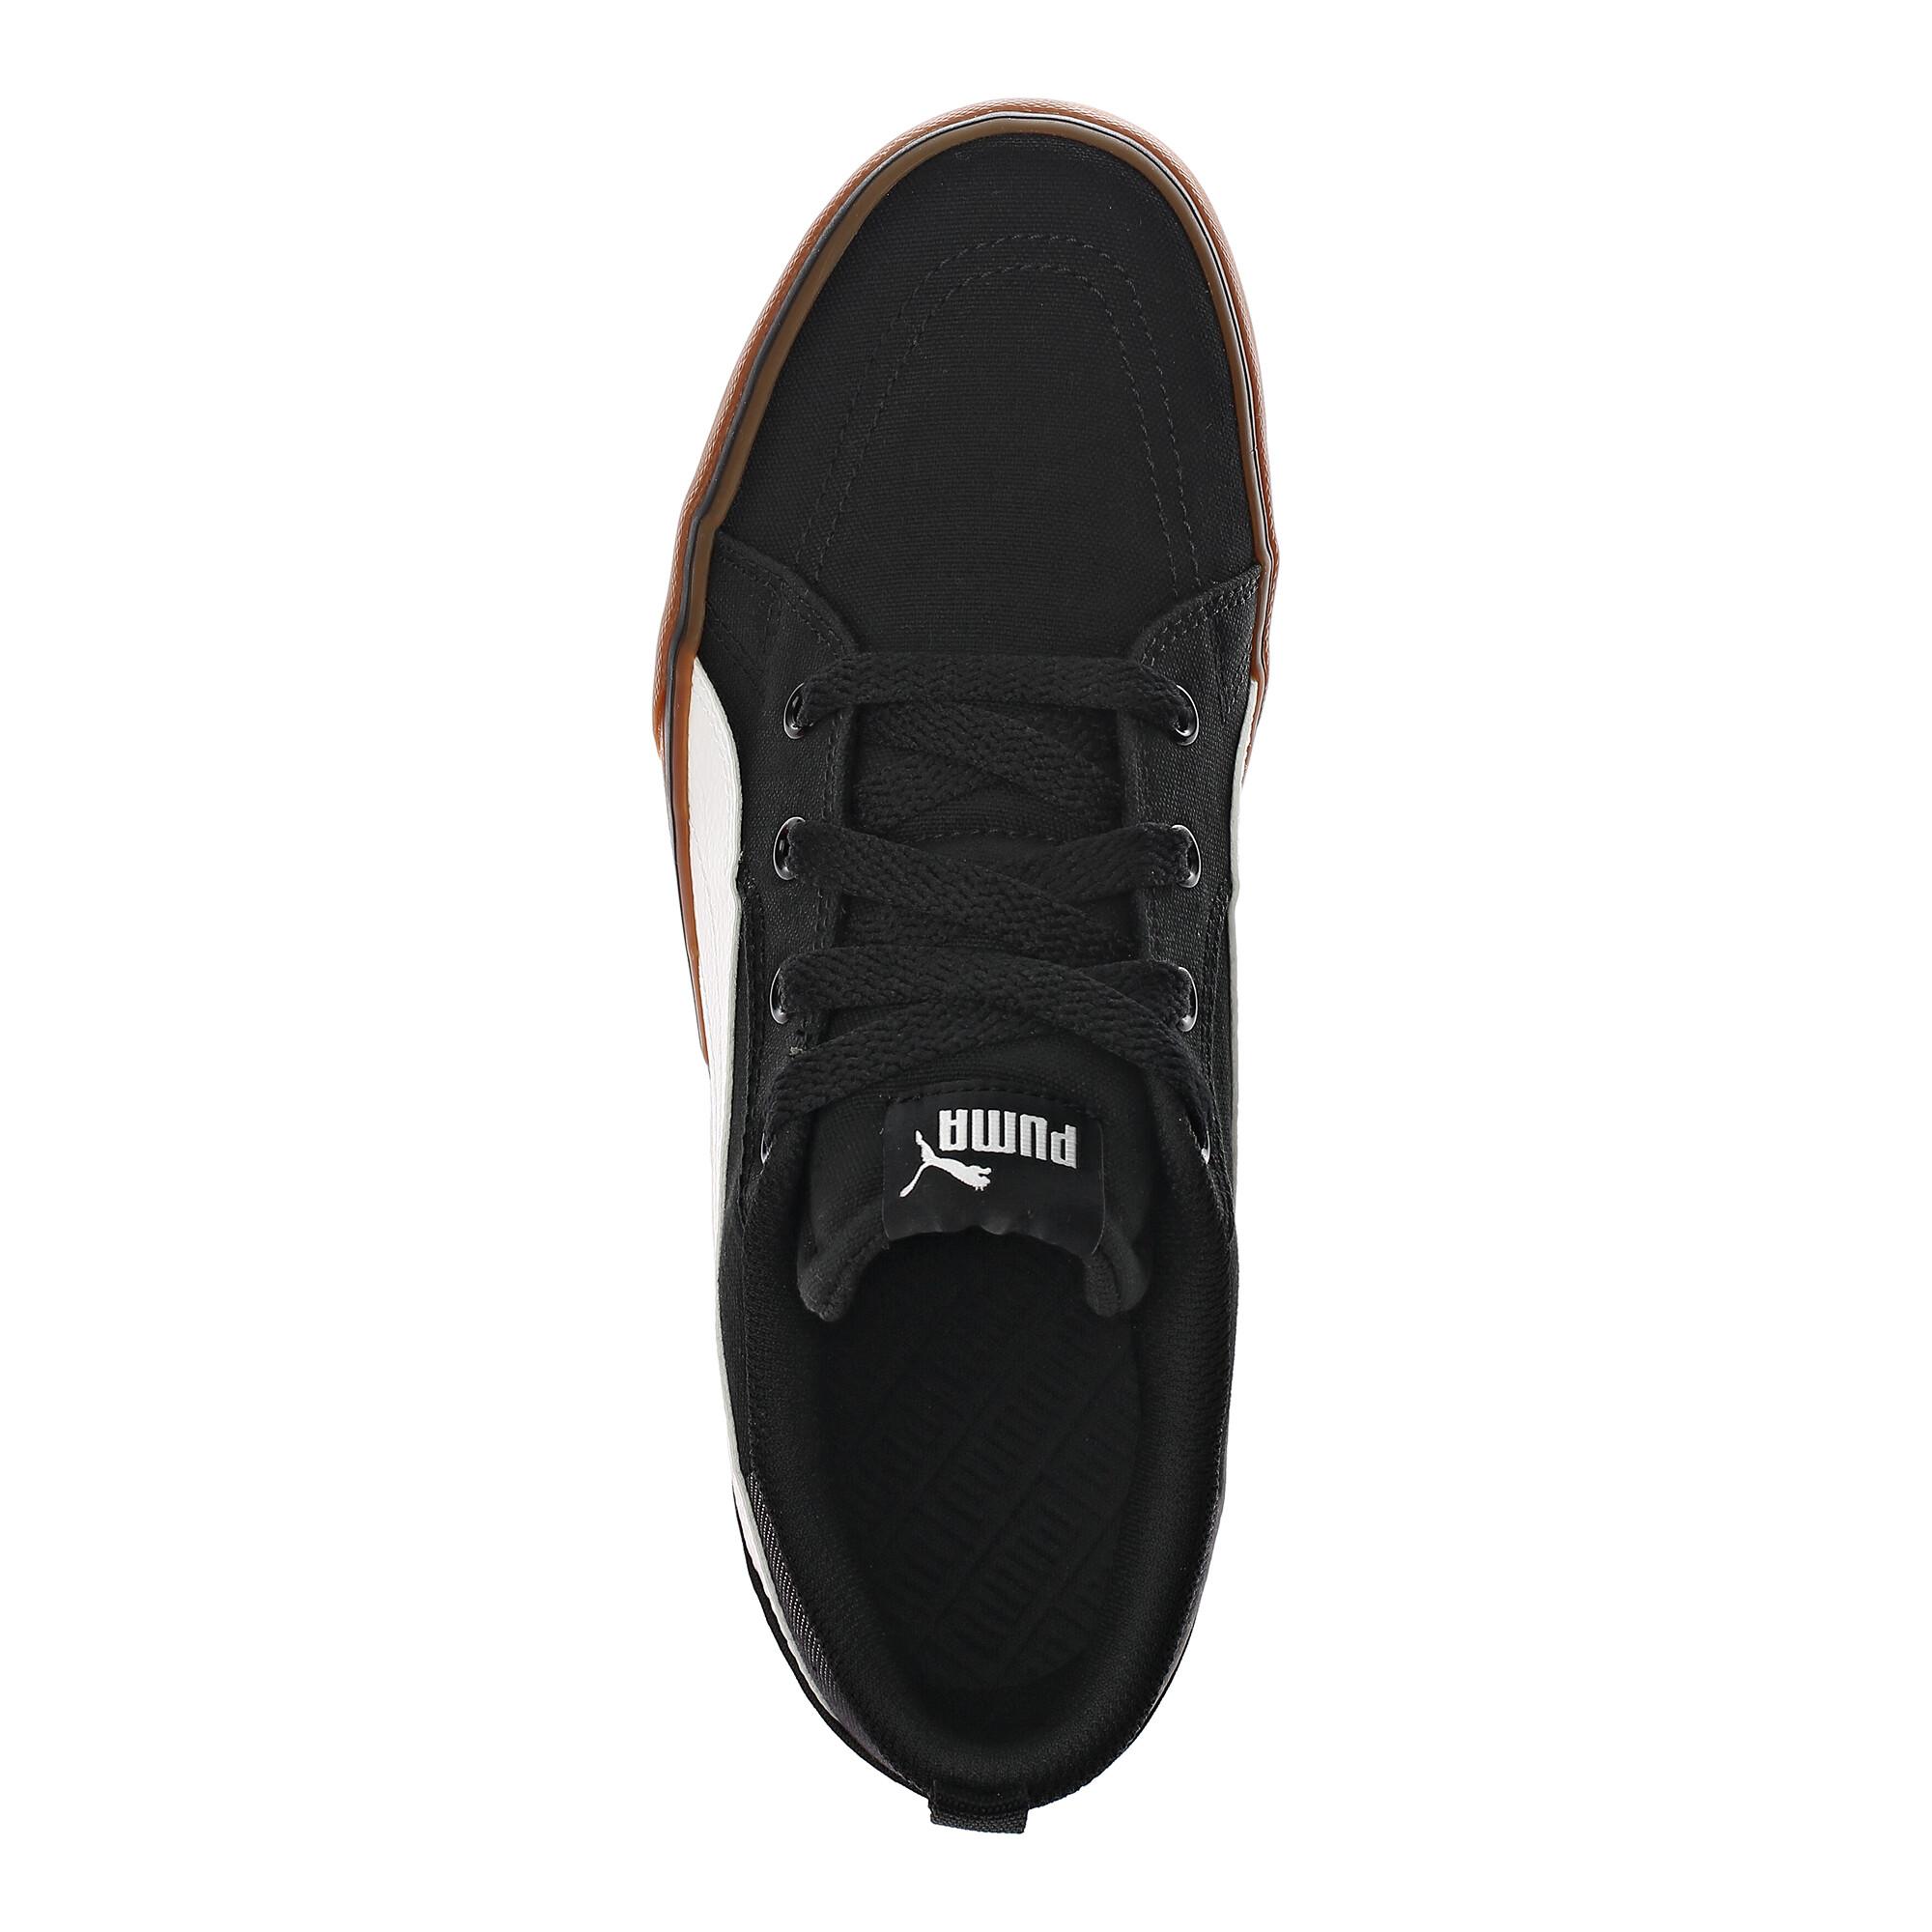 PUMA-PUMA-Bridger-Men-039-s-Sneakers-Men-Shoe-Basics thumbnail 6